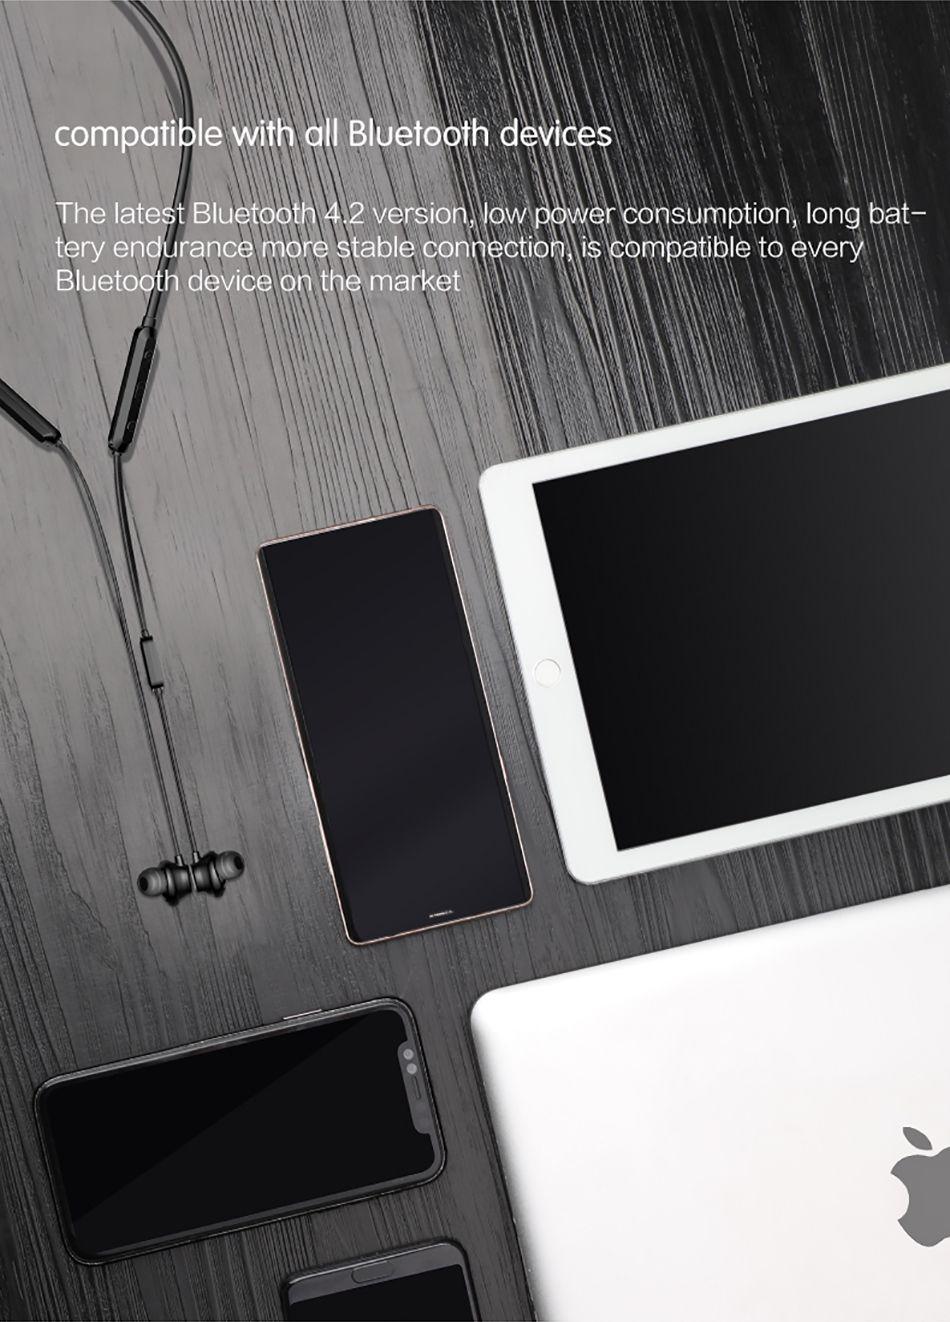 Baseus Encok S11 Neckband In Ear Bluetooth Sports Earphone With Mic (16)